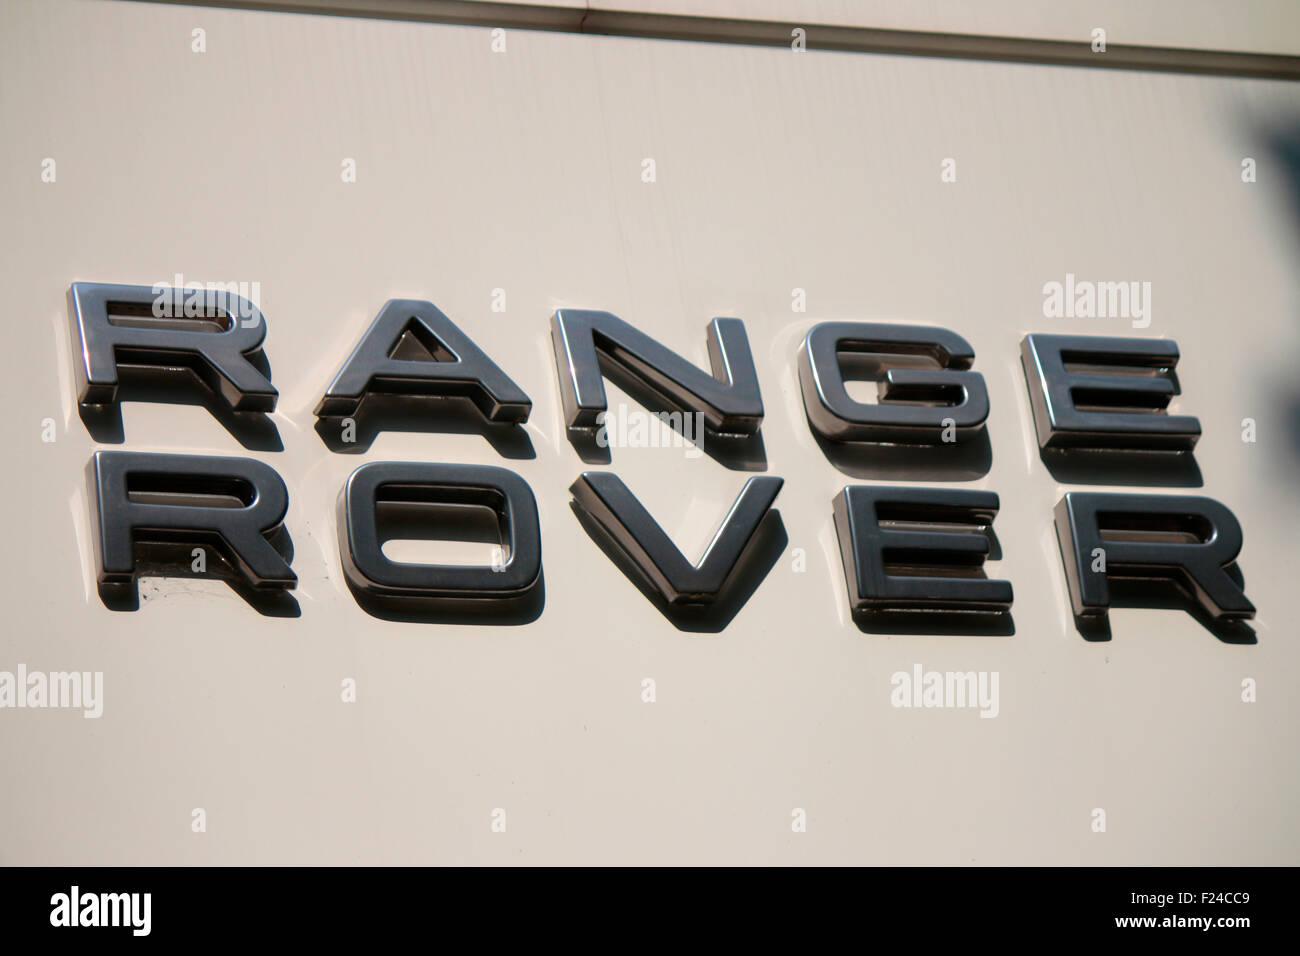 Markennamen: 'Range Rover', Berlin. - Stock Image